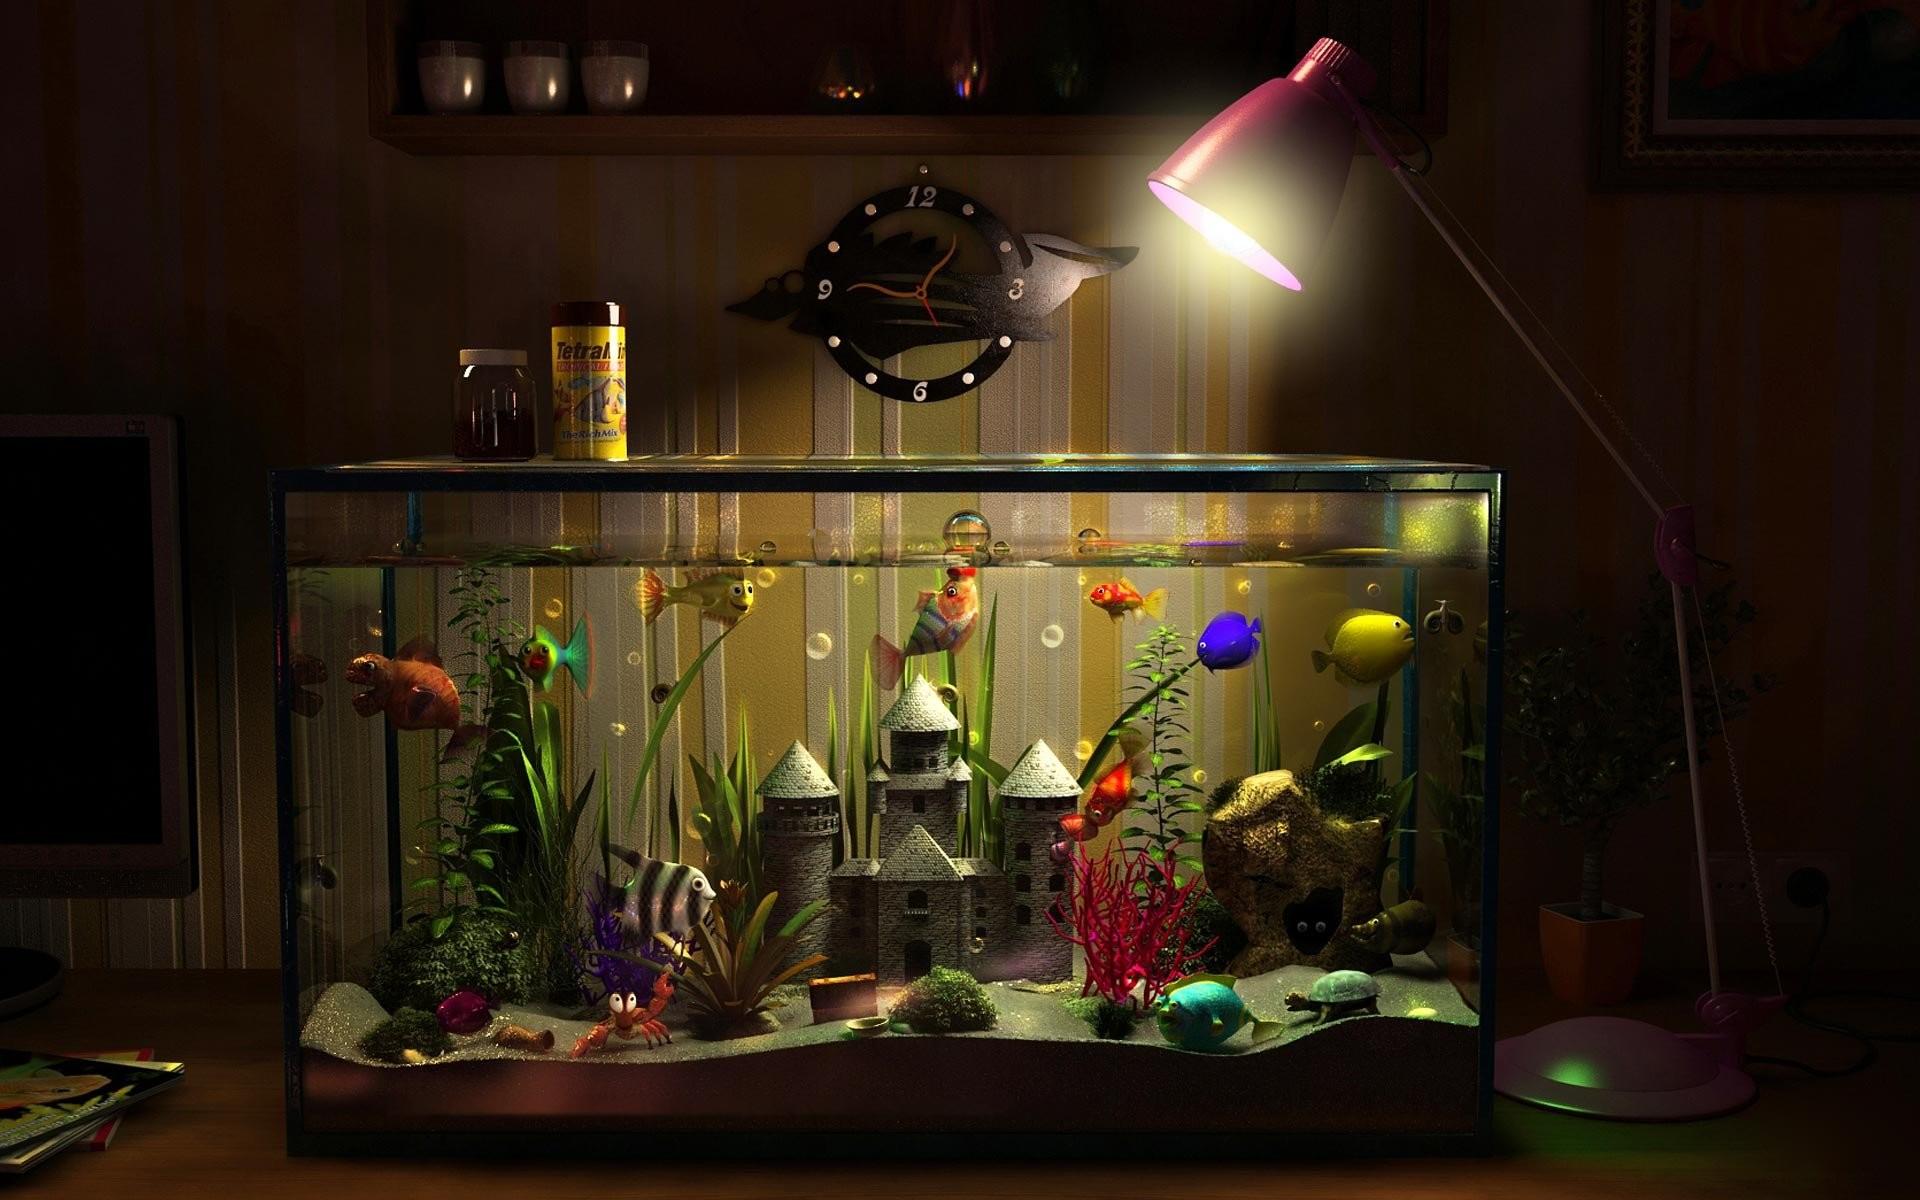 Animated aquarium desktop wallpaper 53 images for Animated fish tank